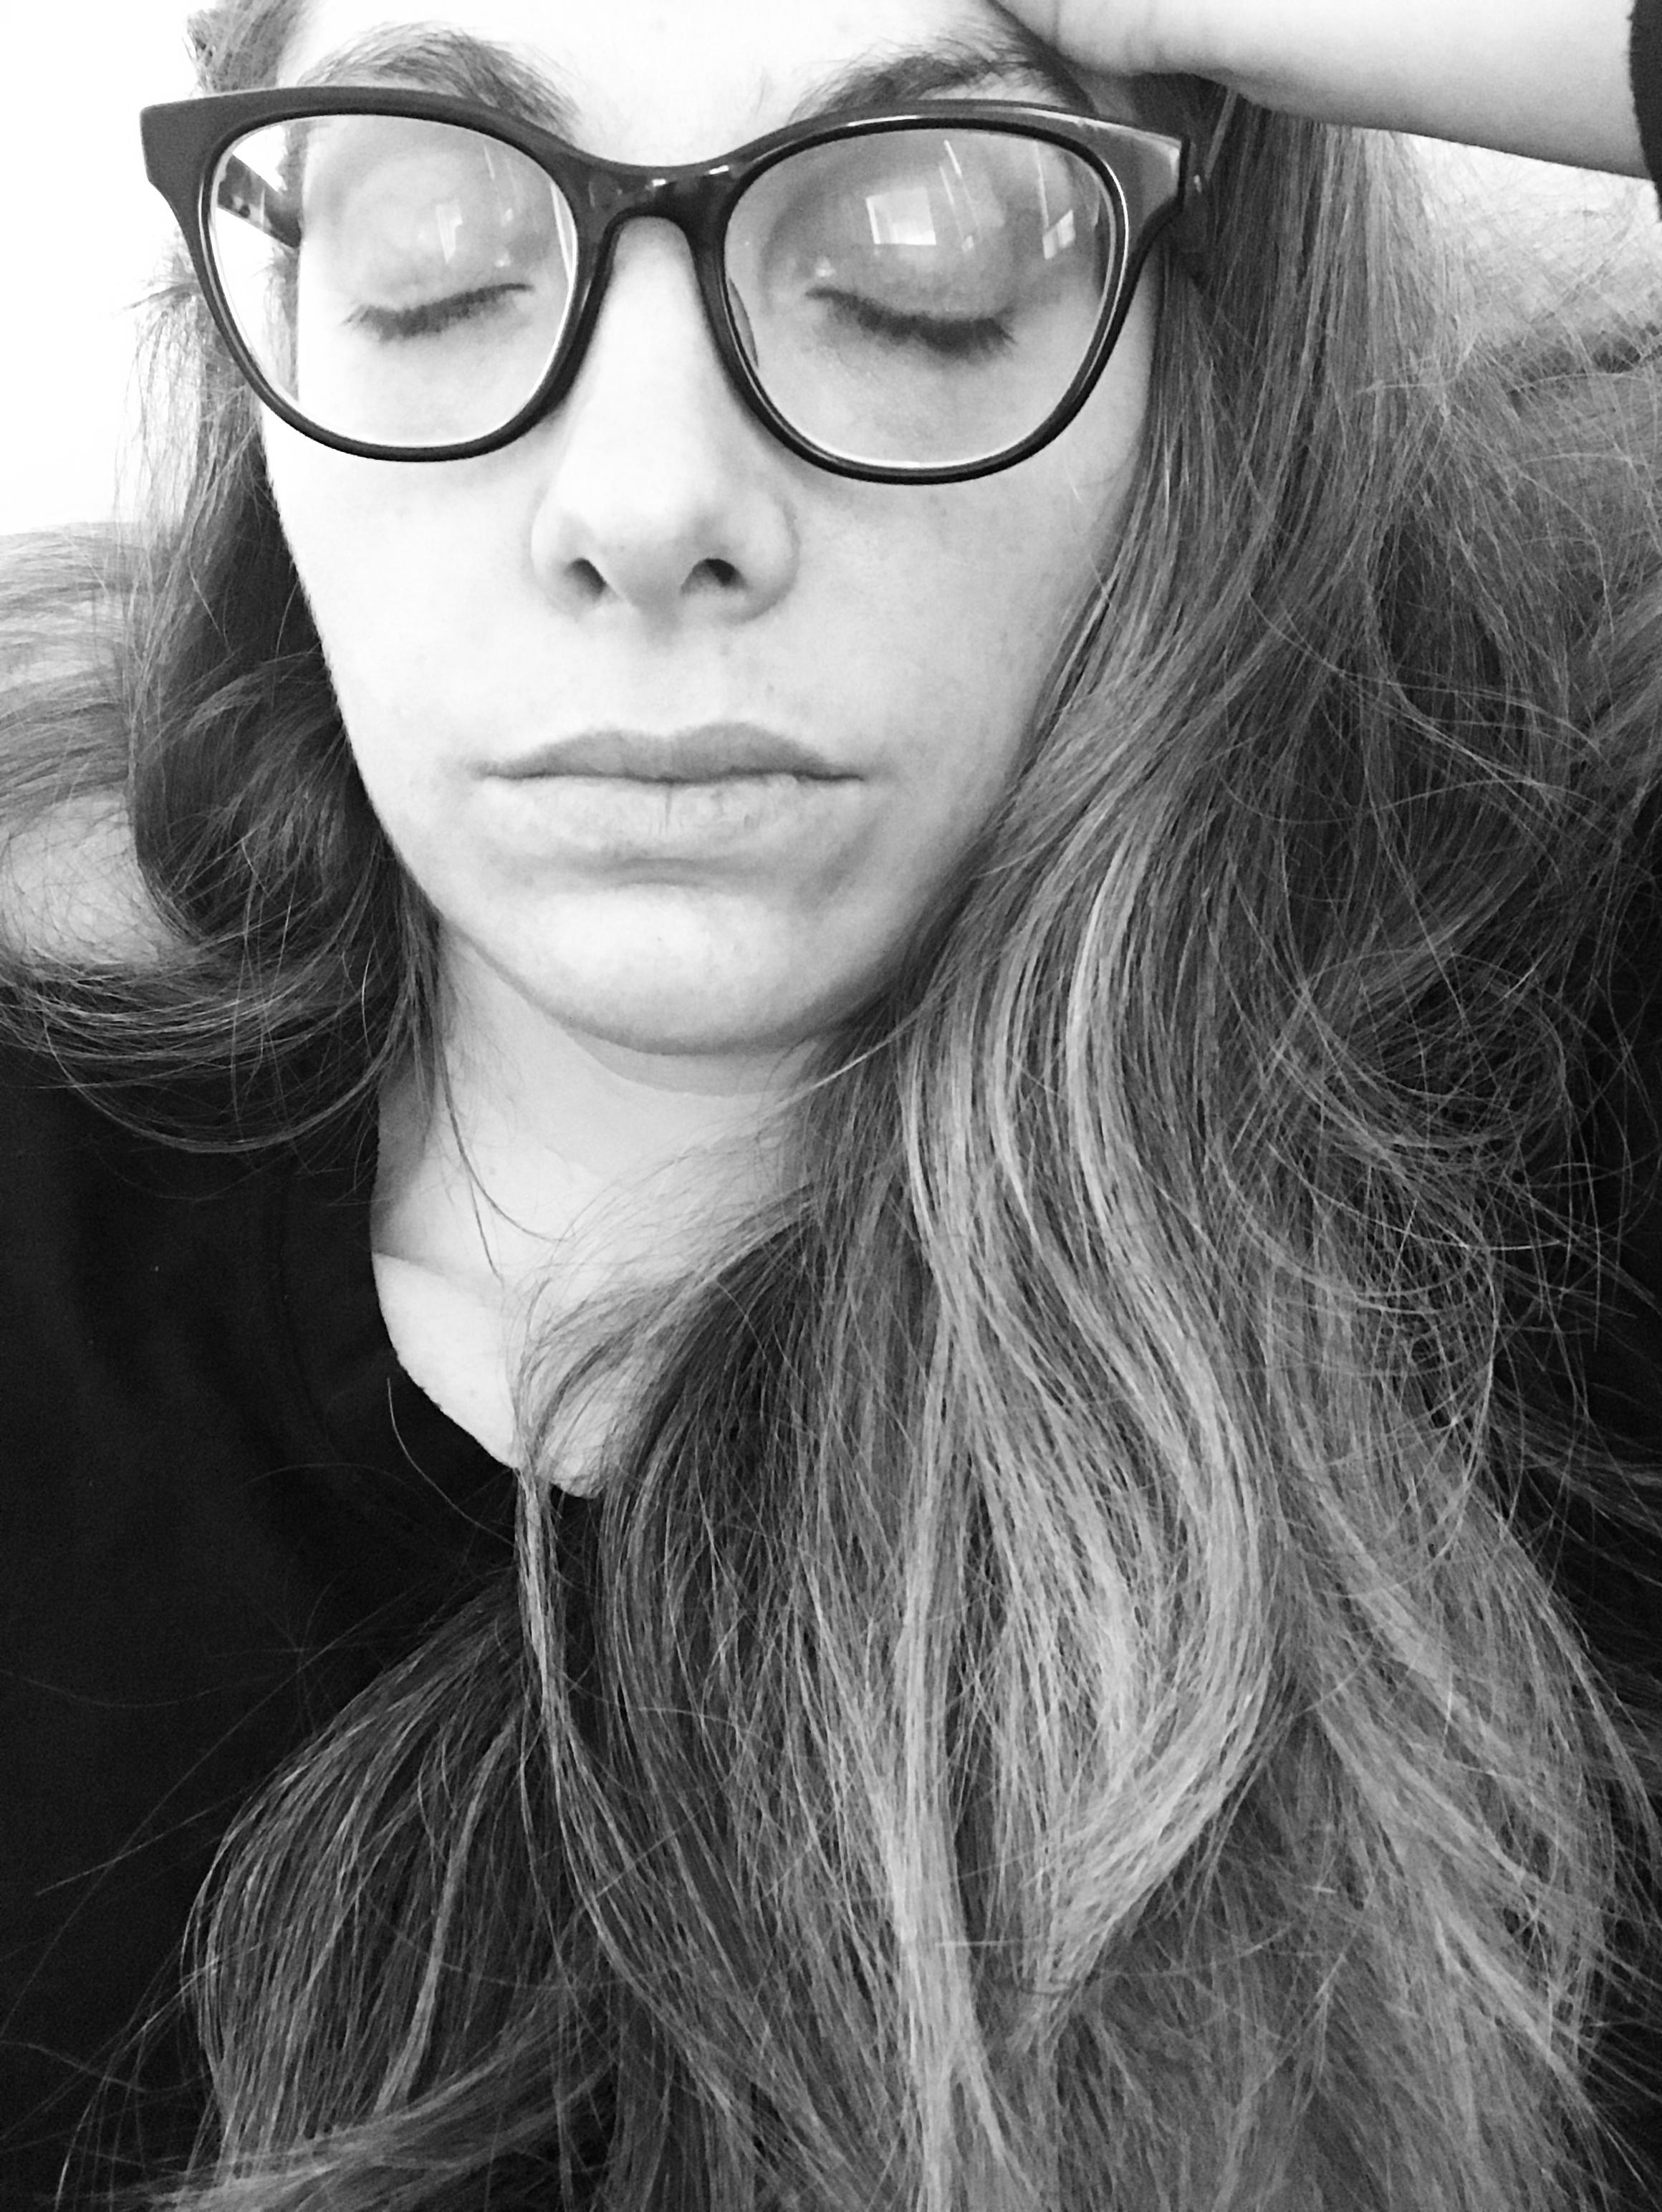 sadness from infertility kathy